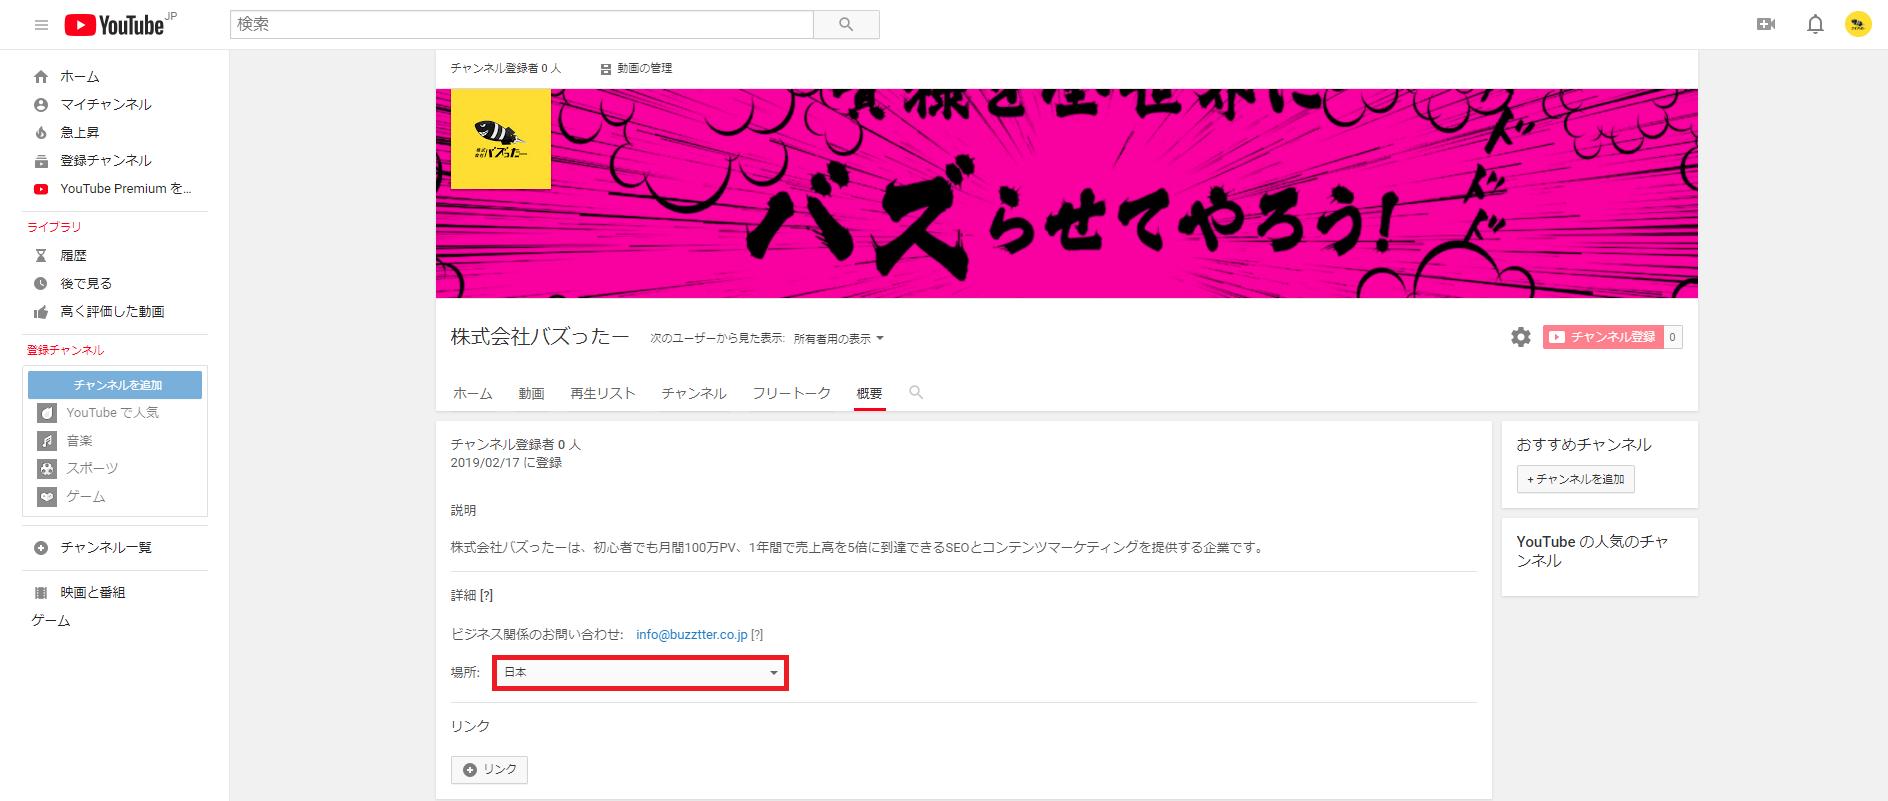 YouTube ブランドアカウント 作成-13